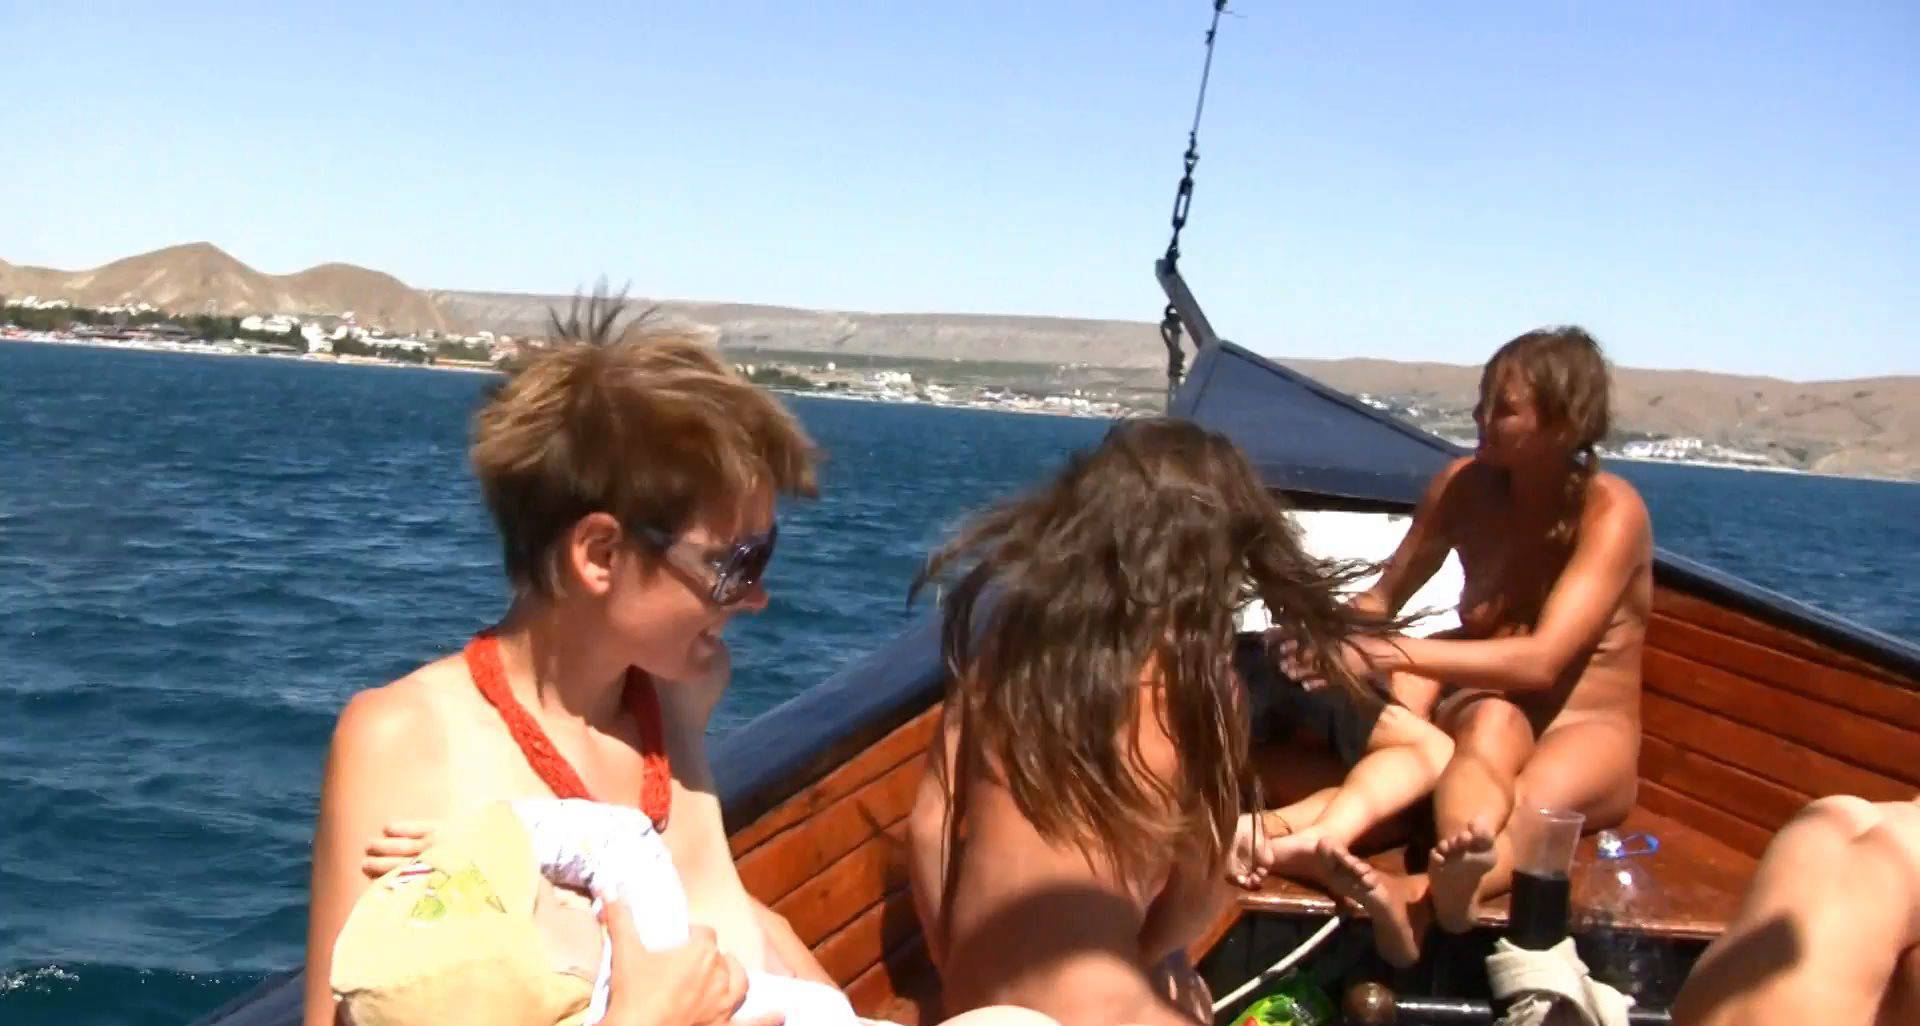 Ukrainian Sea Boating - 1